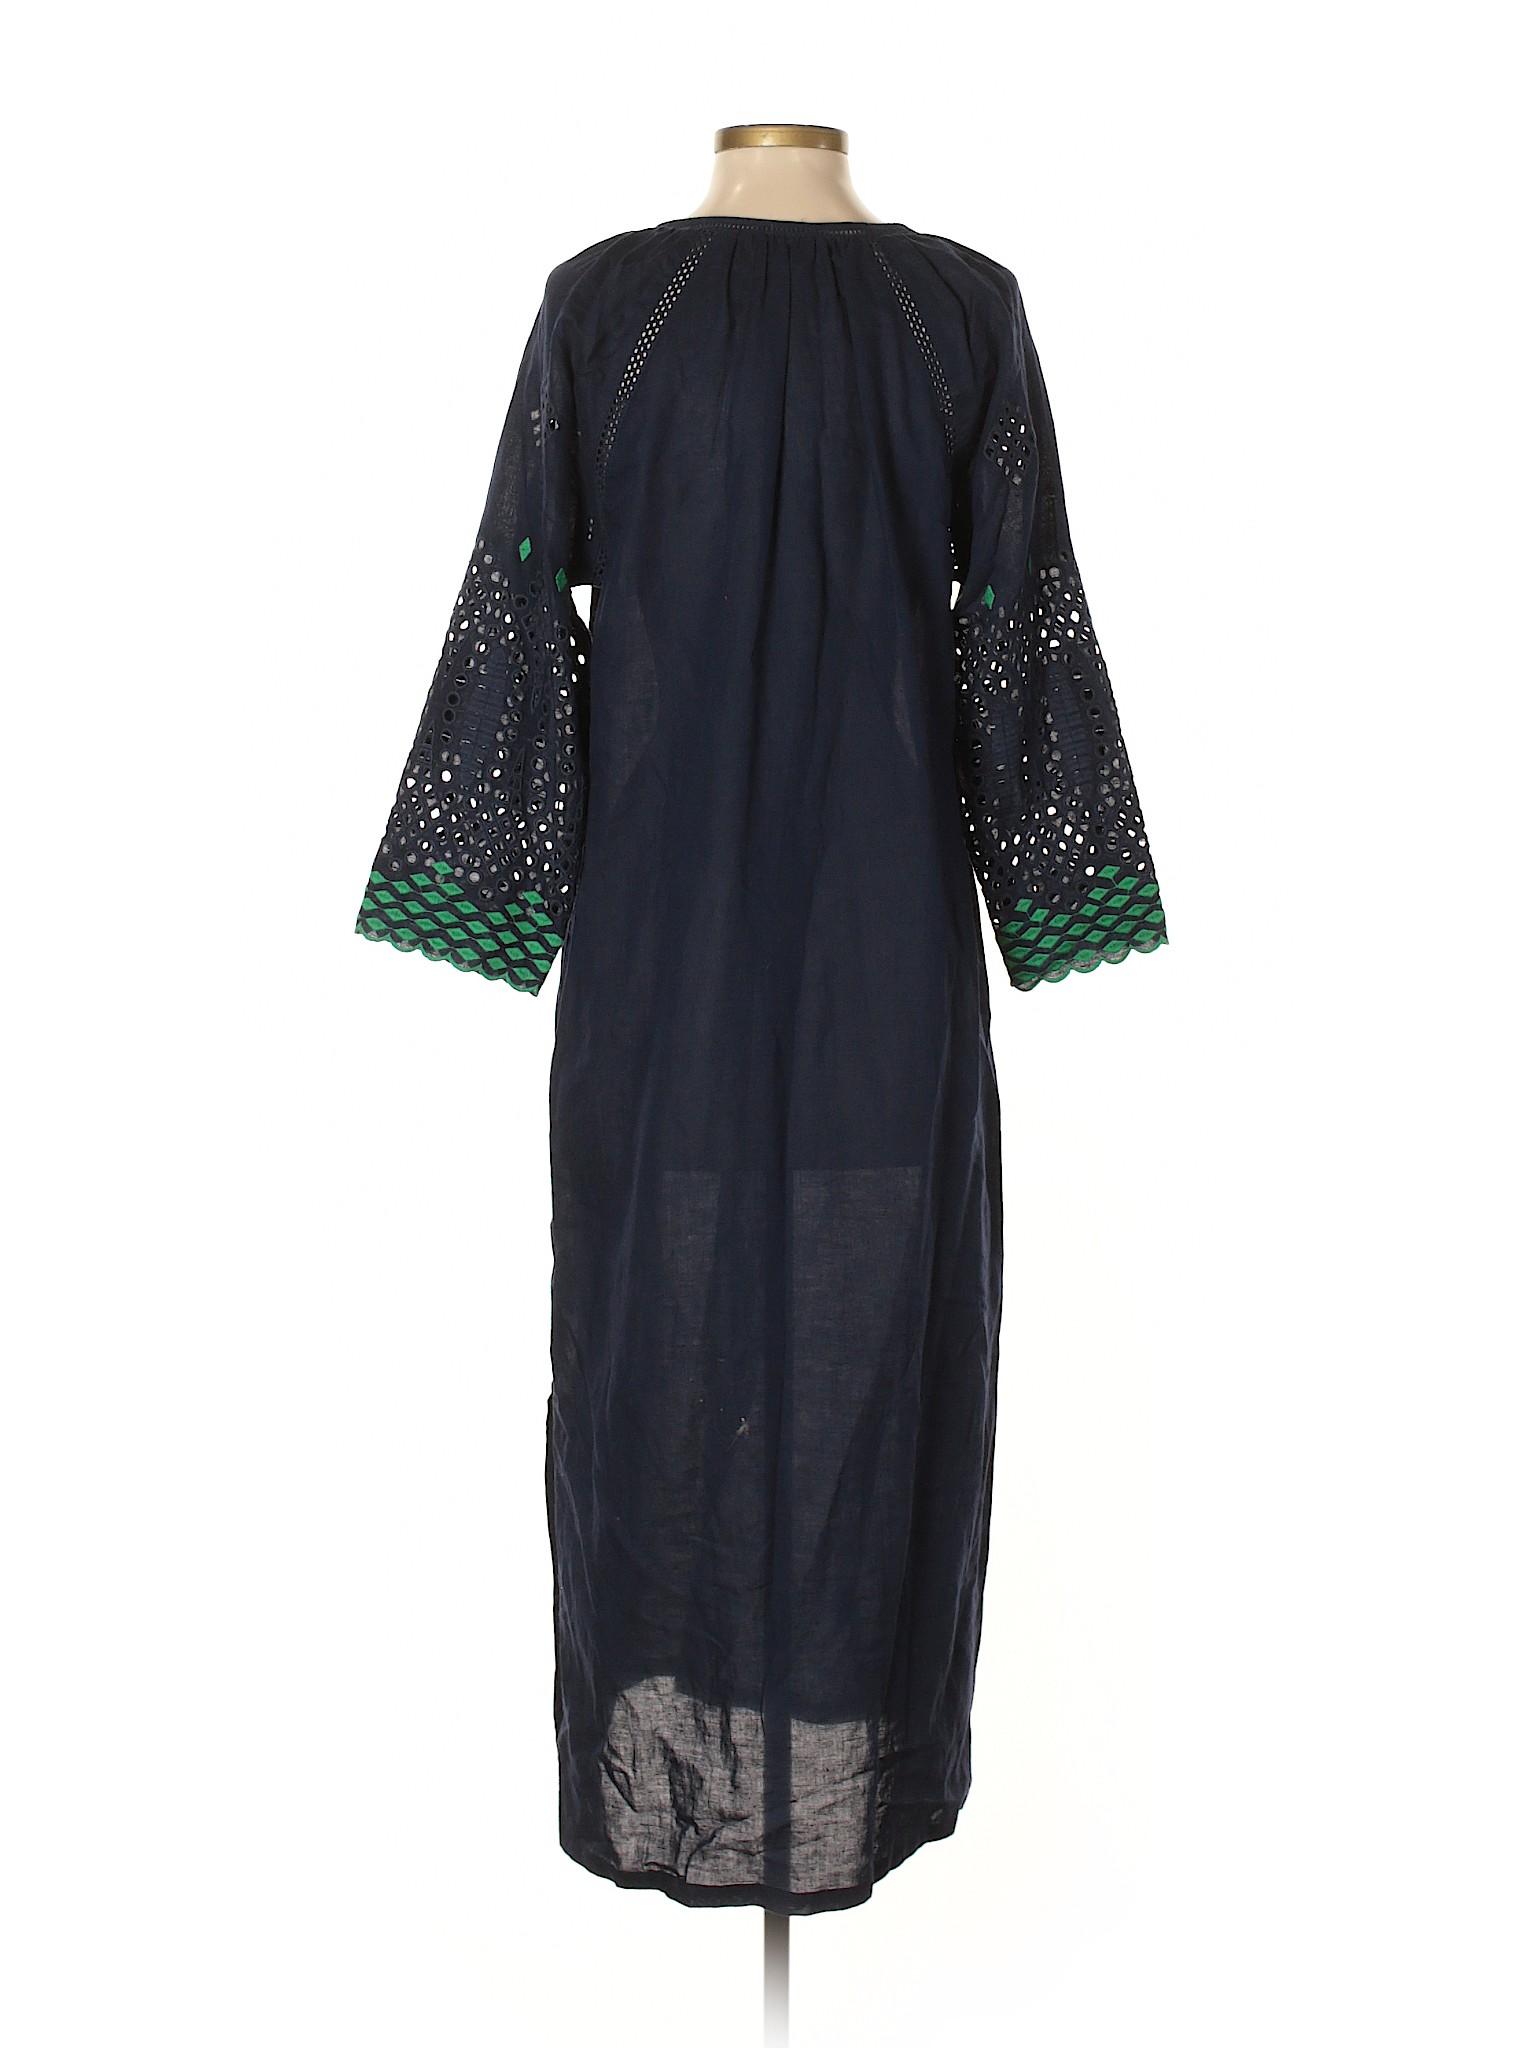 Selling J Crew J Crew Selling Dress Casual Casual Dress tv4wqzSx